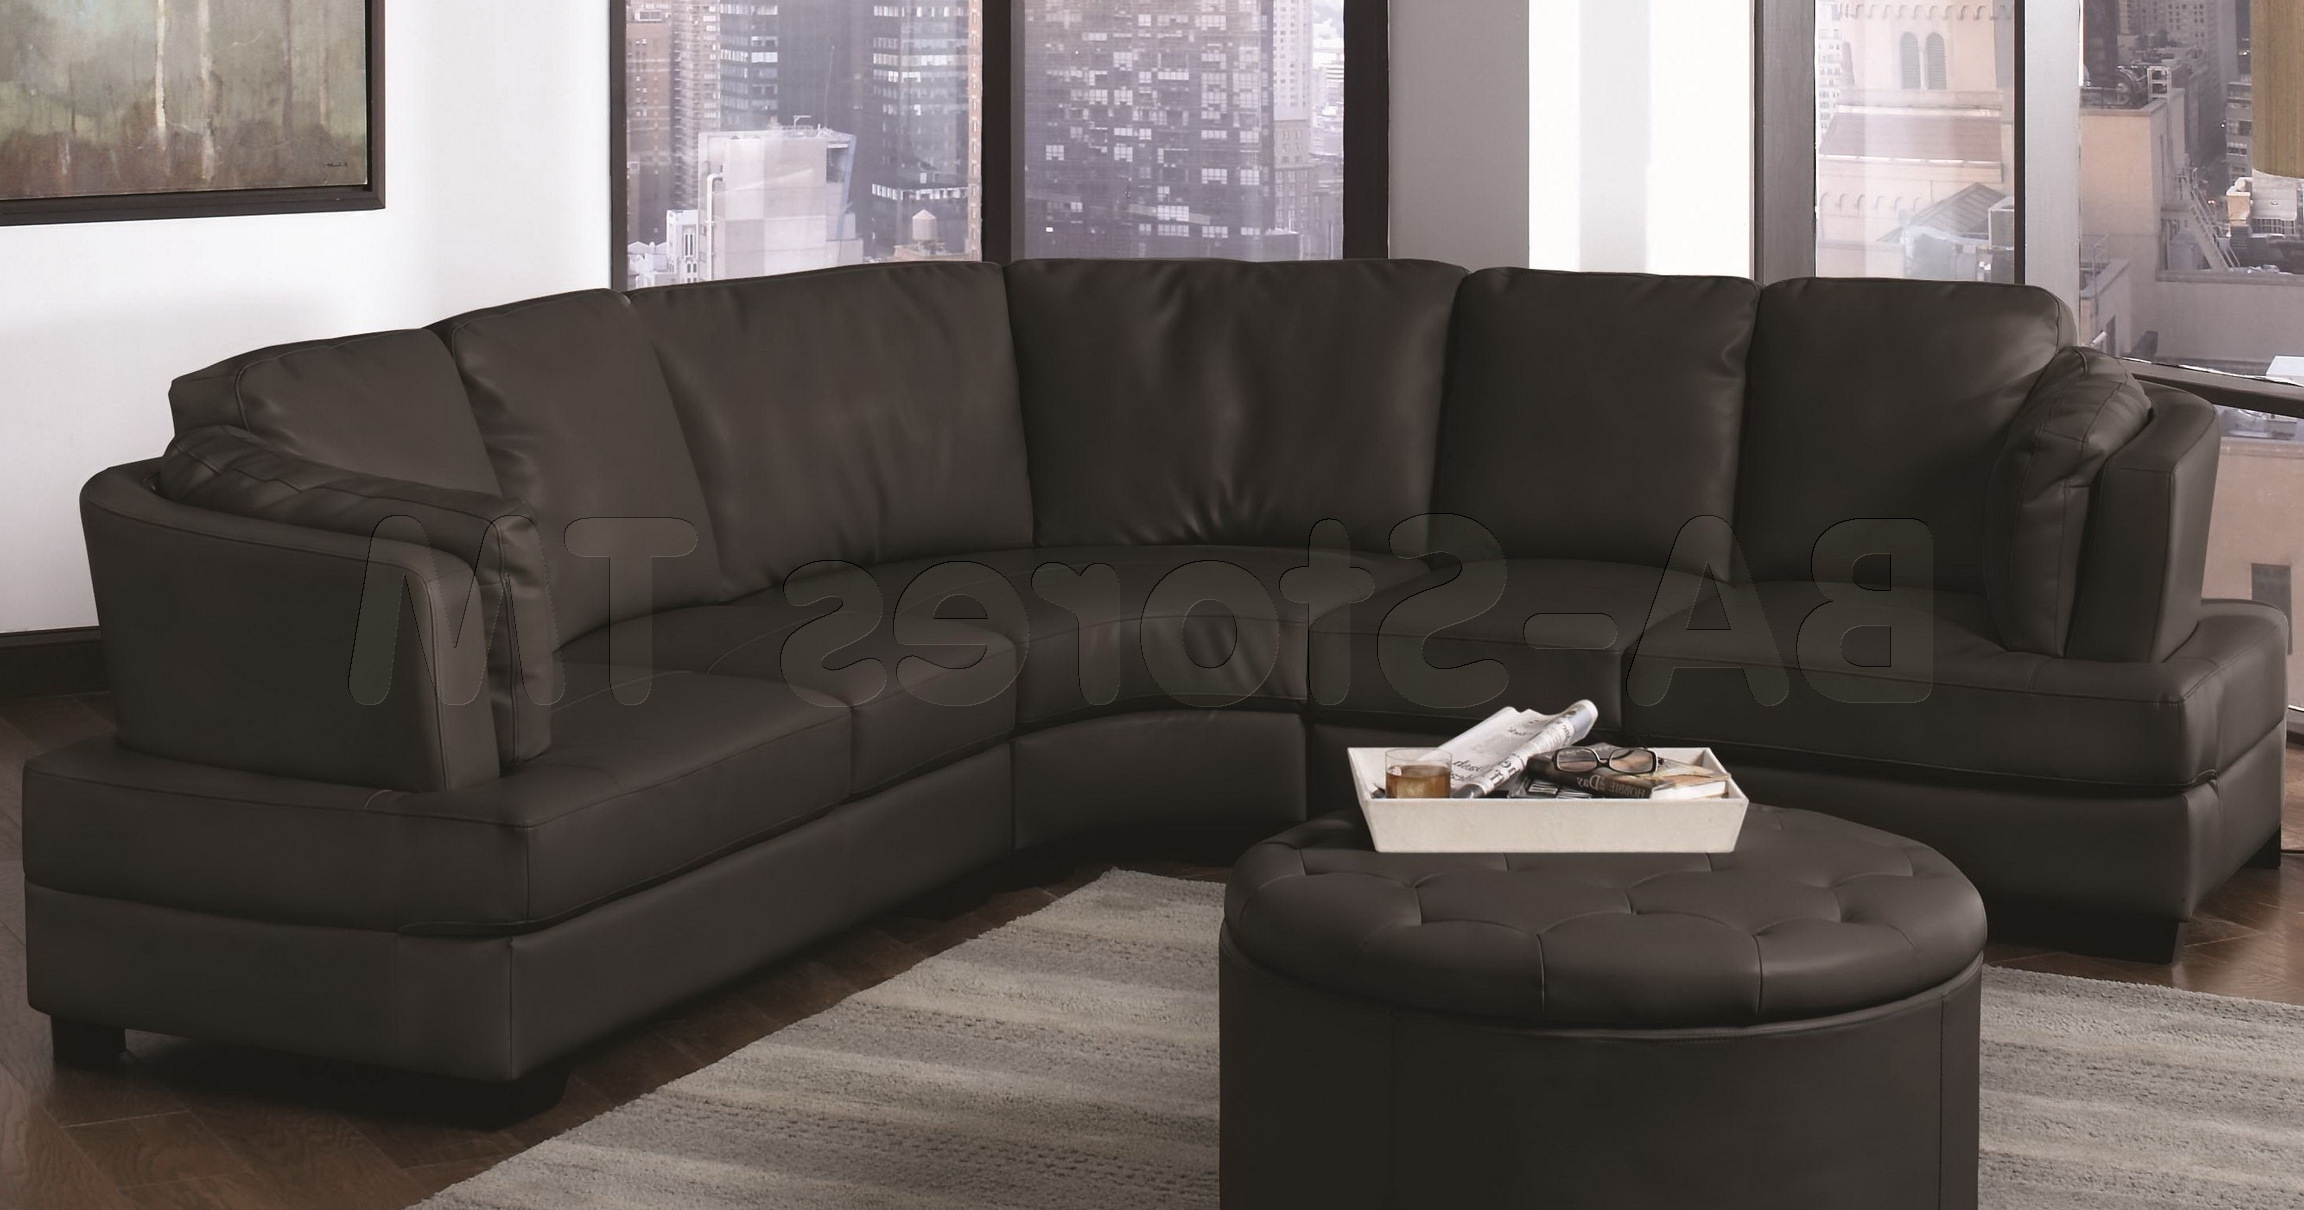 2017 Circular Sectional Sofas Inside Trend Circular Sectional Sofa 57 With Additional Living Room Sofa (View 7 of 15)